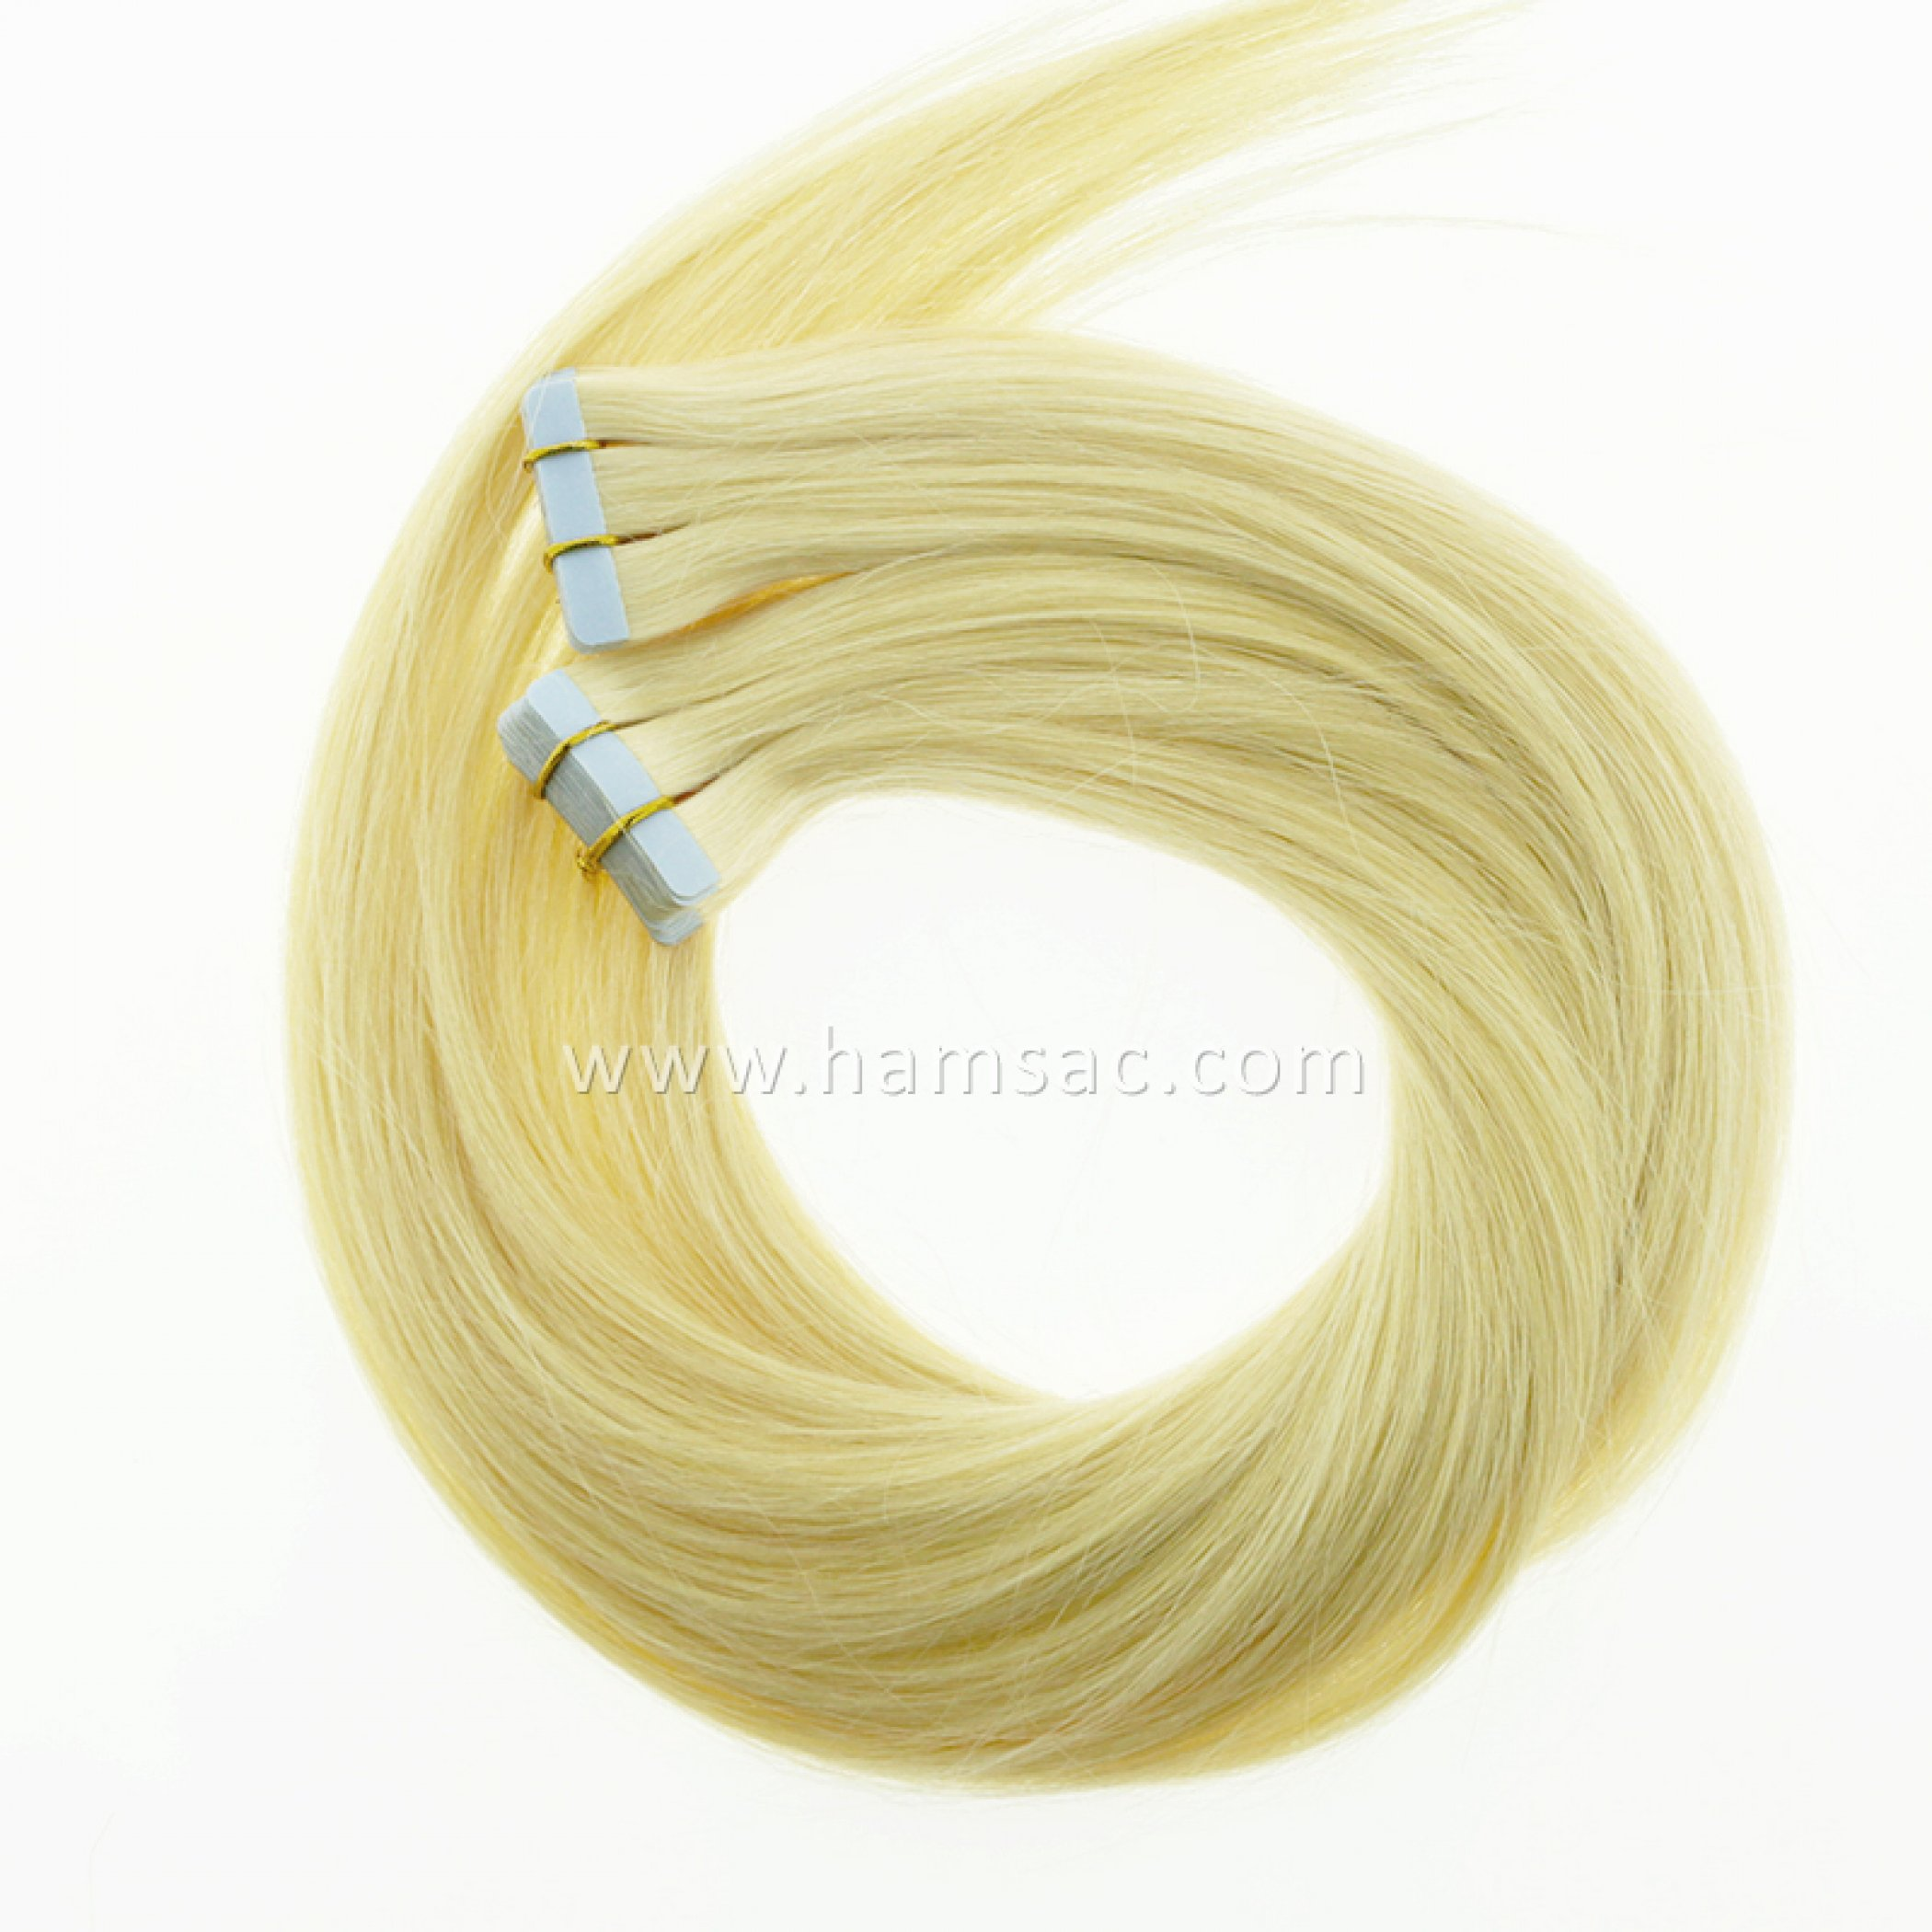 Bant Kaynak Saç Platin Sarı